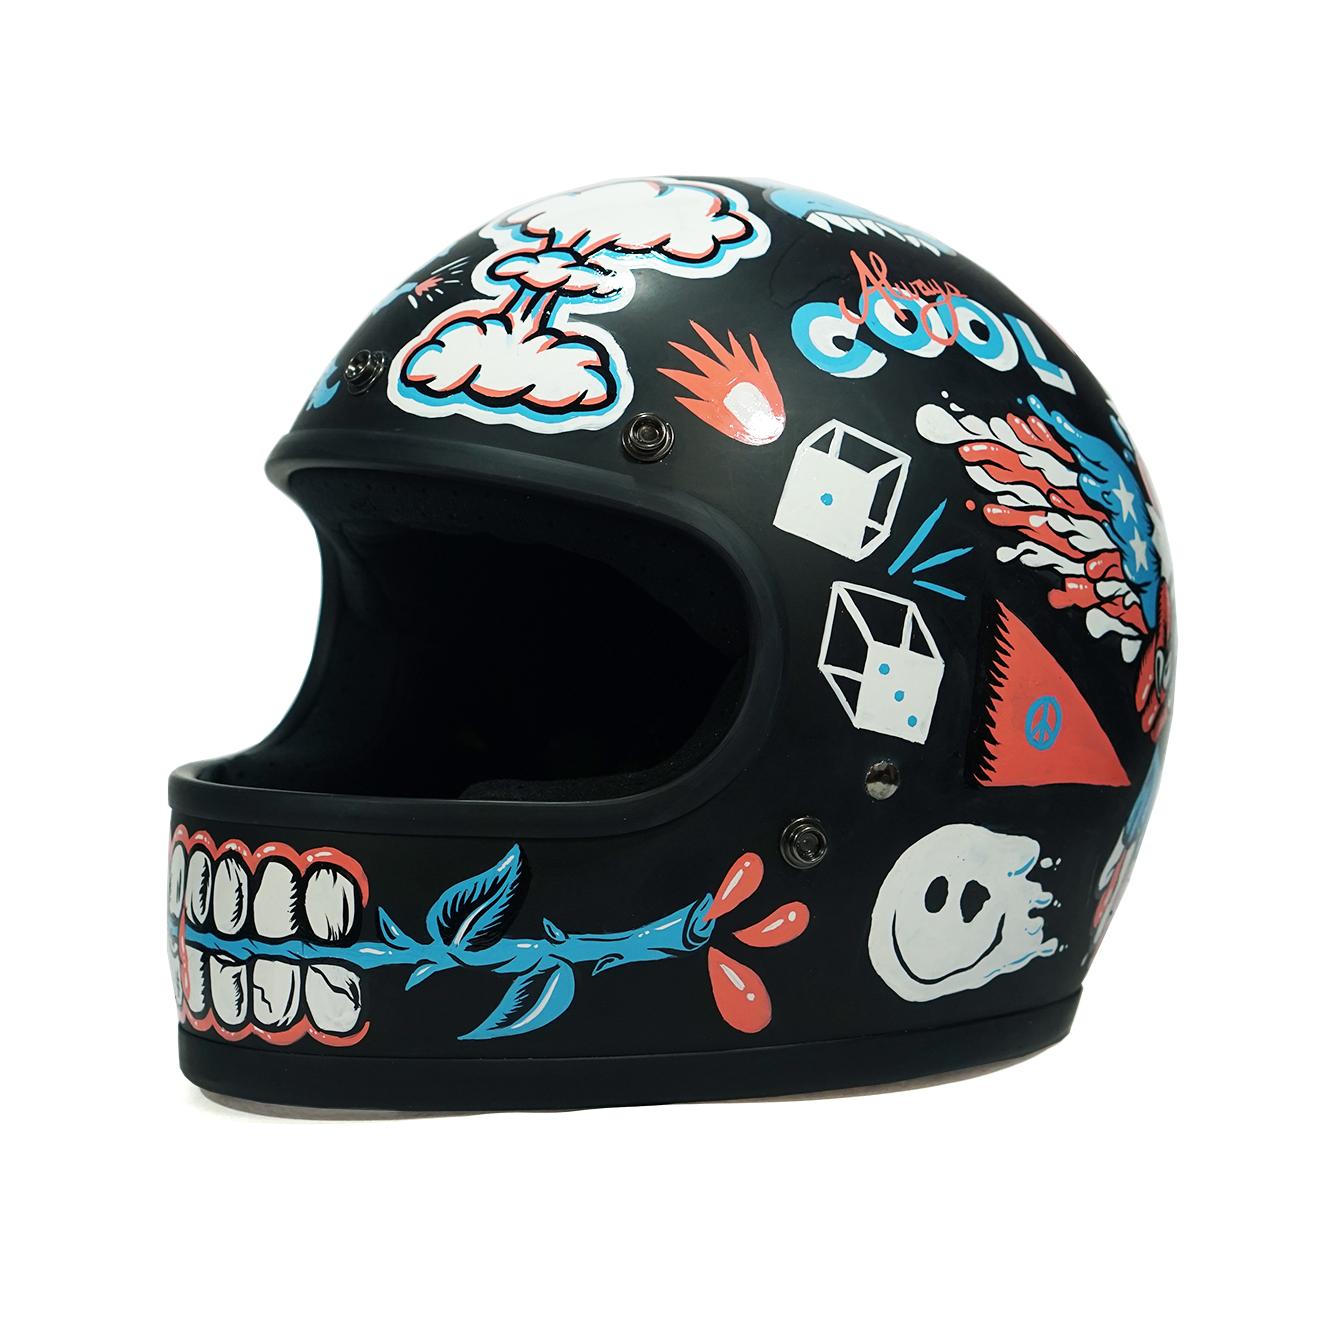 helmet2.png